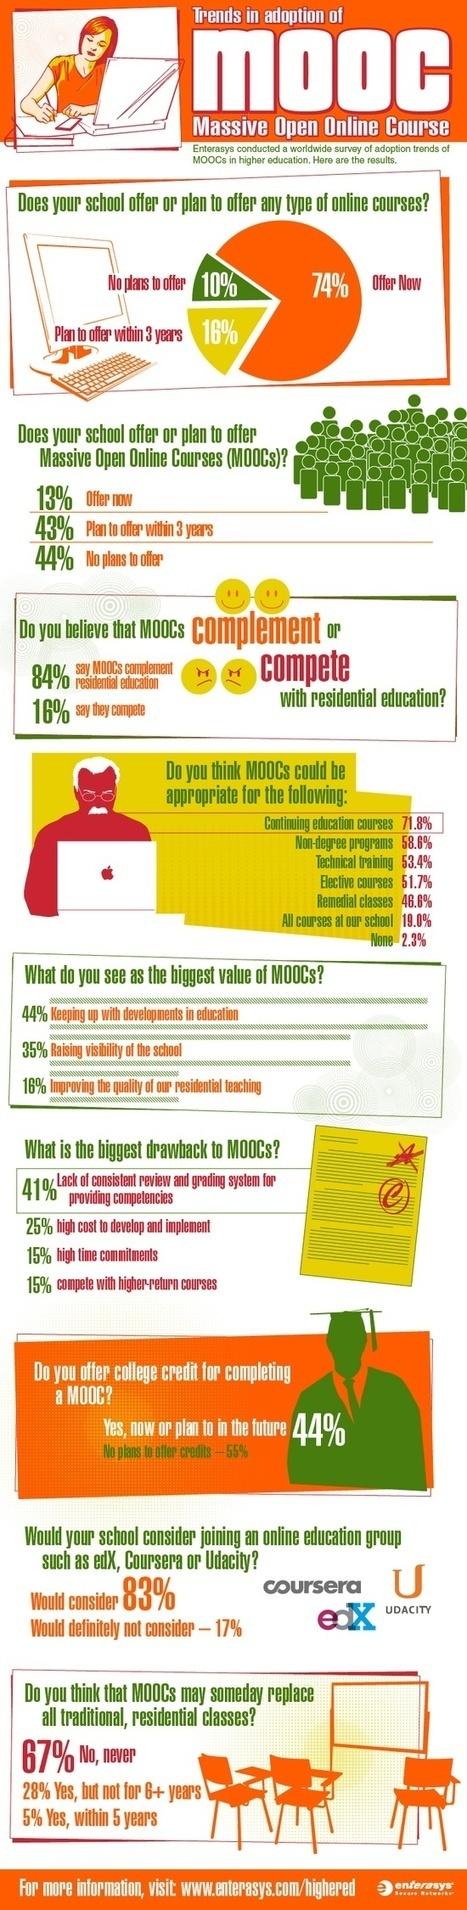 MOOC Latest Trends [INFOGRAPHIC]   iEduc   Scoop.it